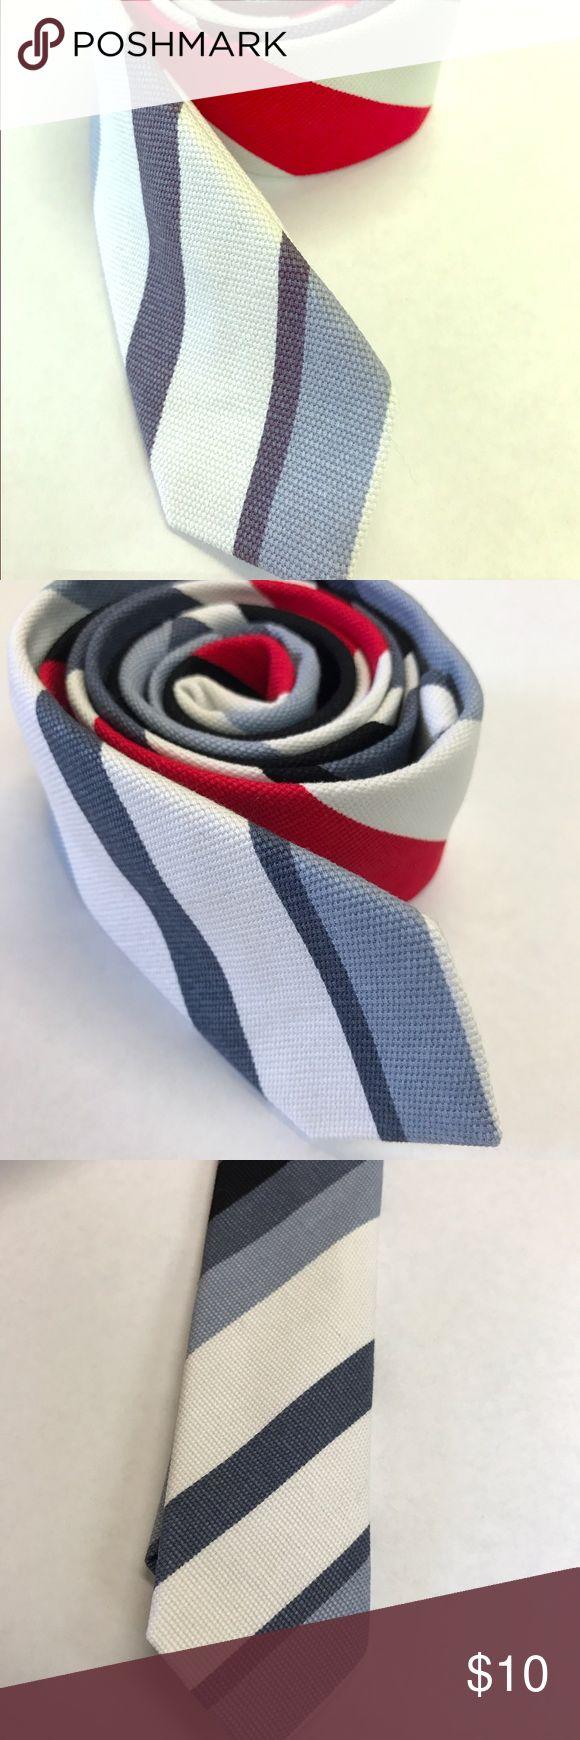 Ultra Thin Skinny Neck Tie Necktie Stripped Gray Great trendy ultra thin skinny necktie! Unbranded Accessories Ties